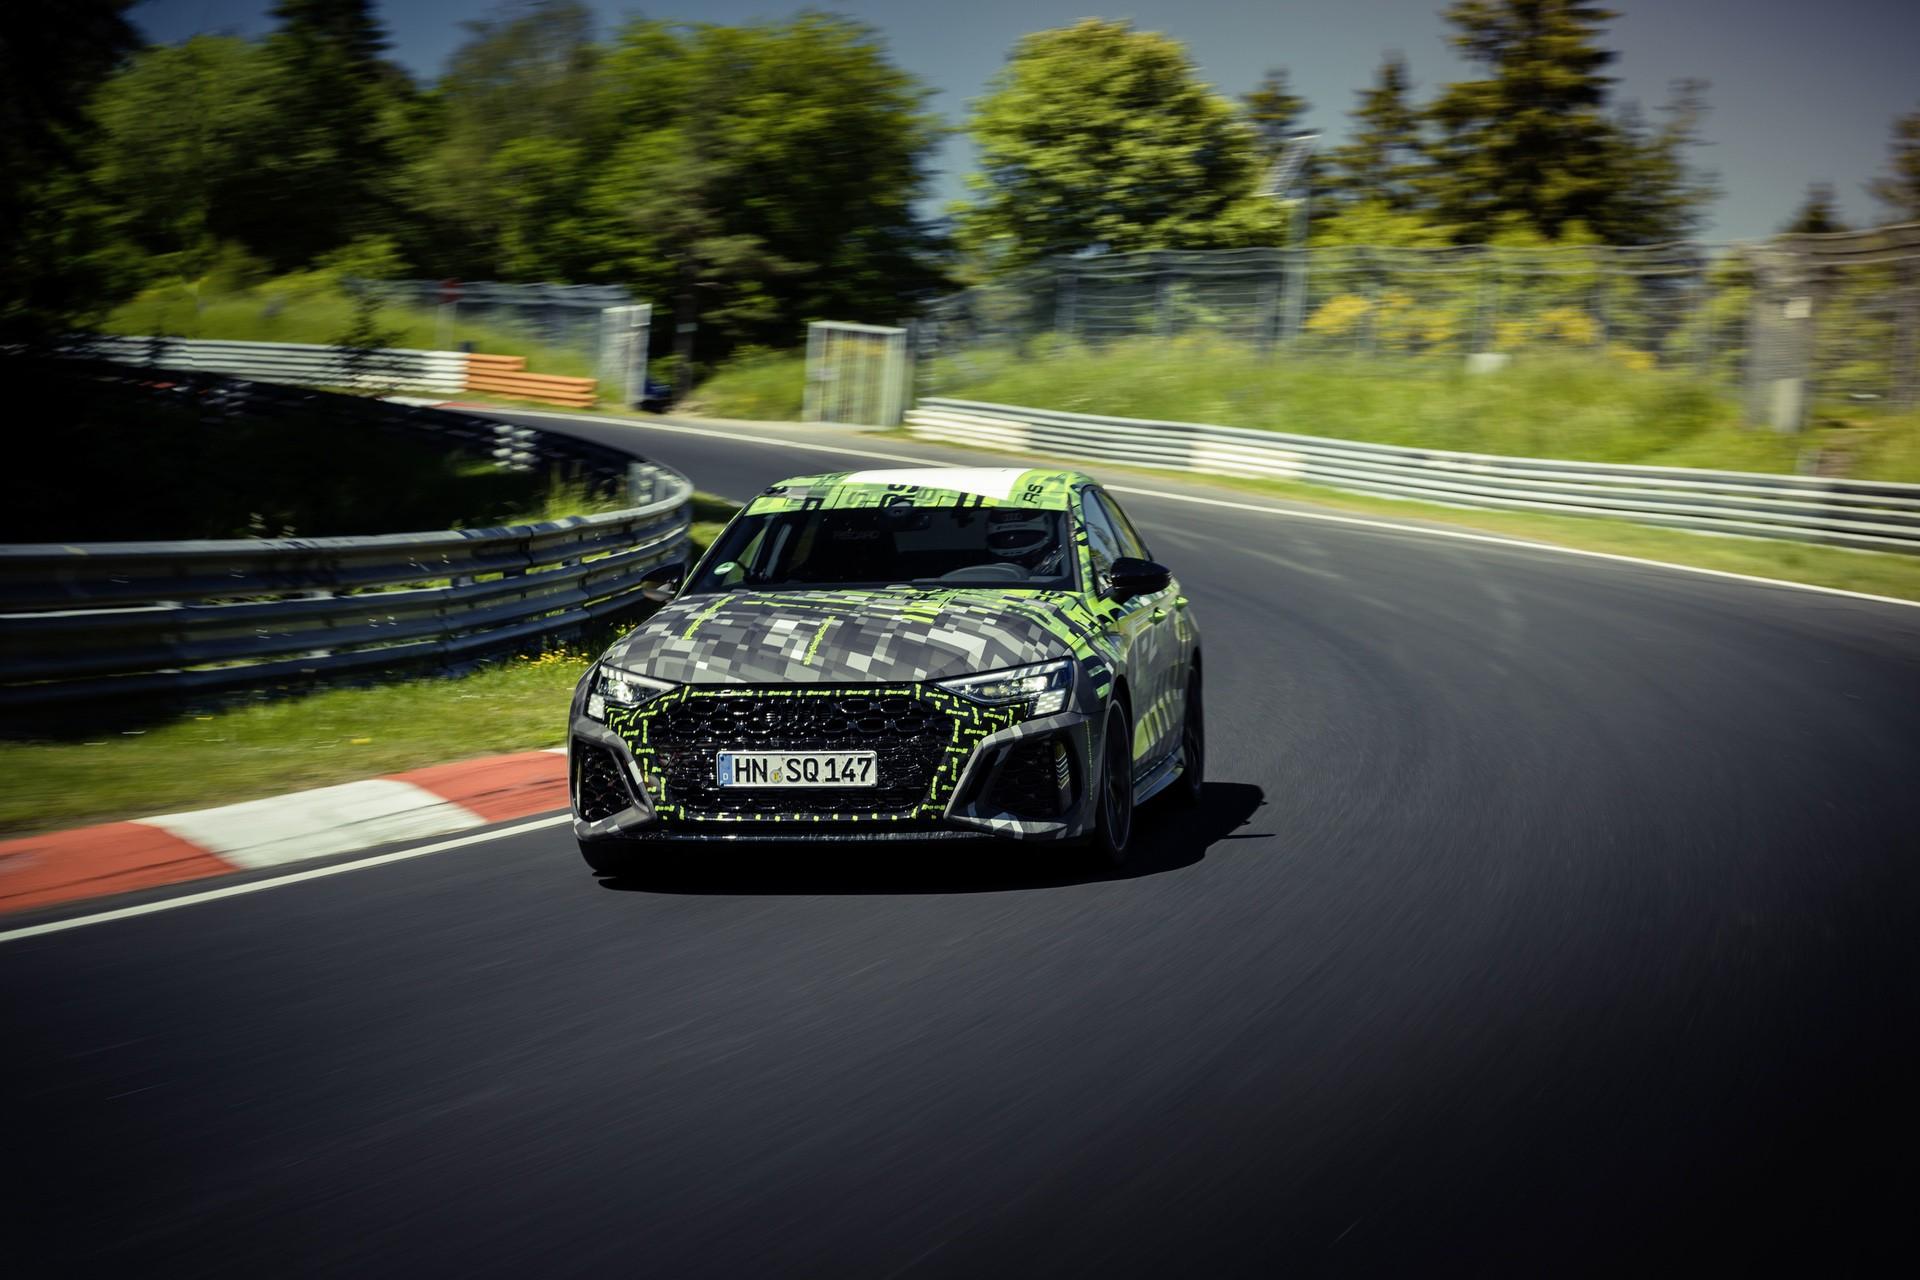 Audi_RS3_Sedan_Nurburgring_lap_record-0014